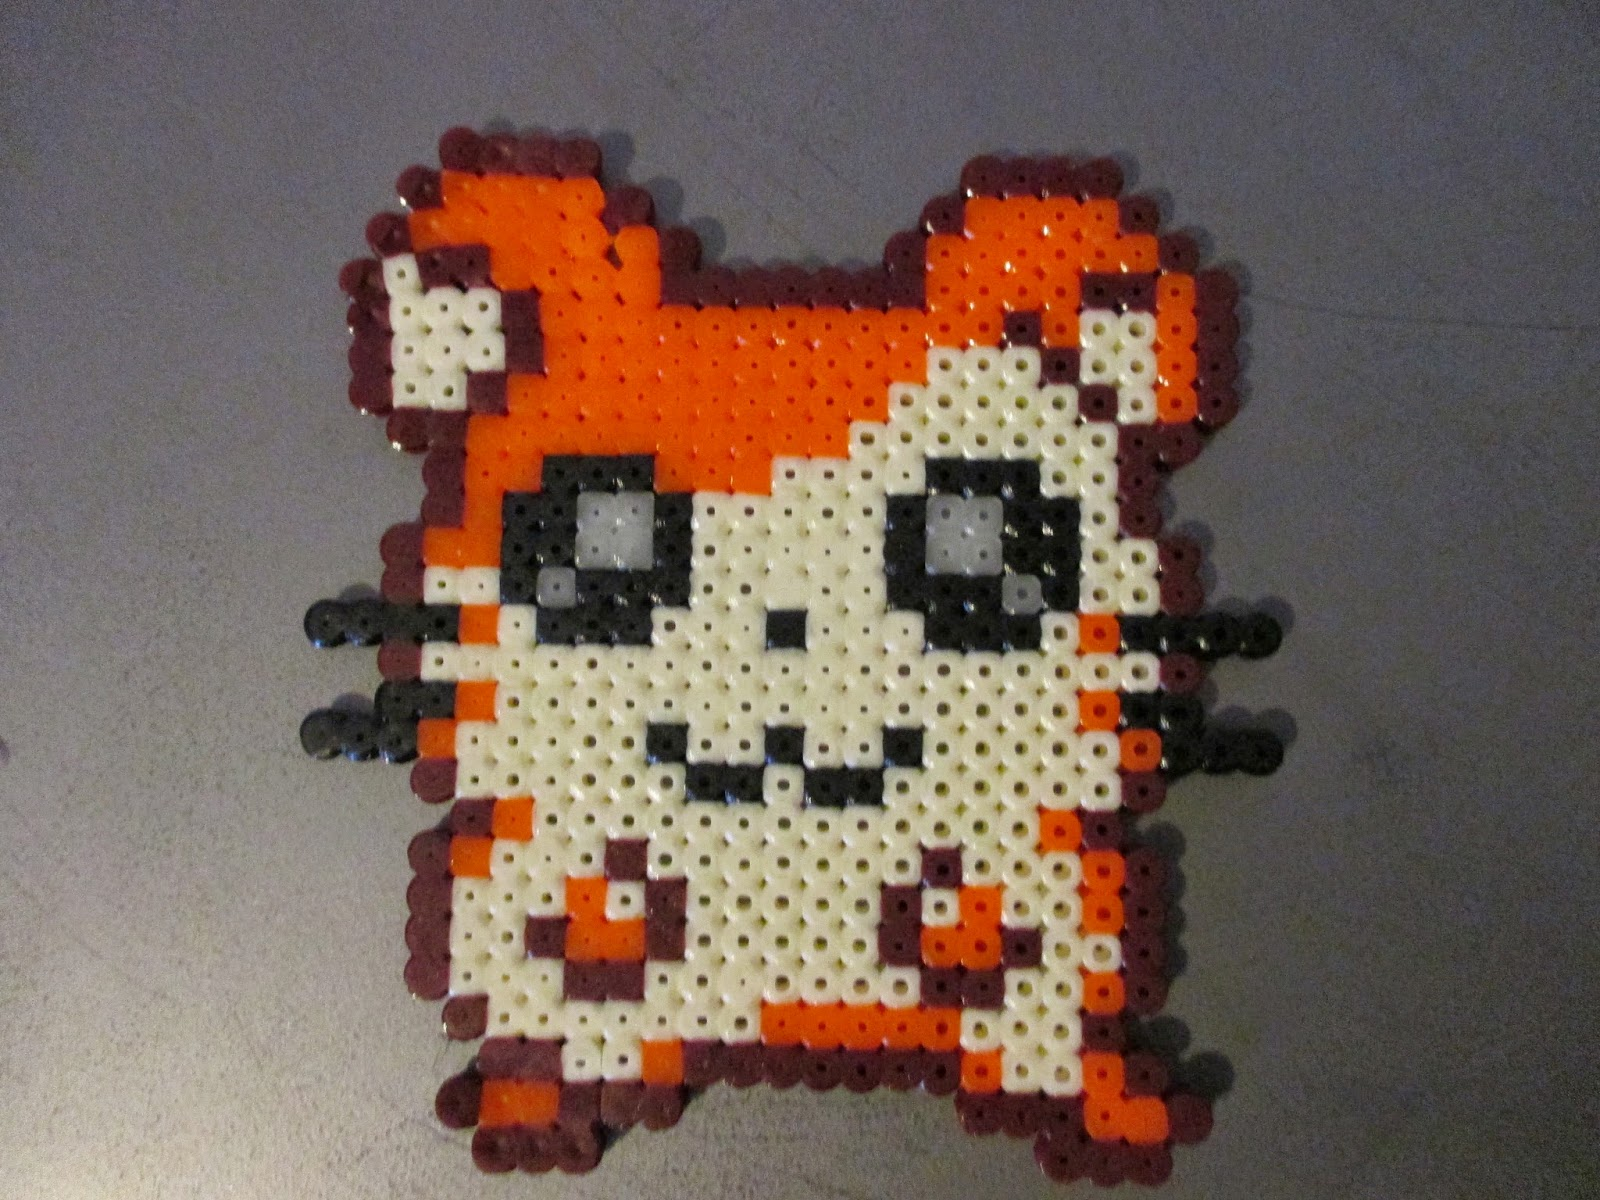 modèle pokémon pixel art